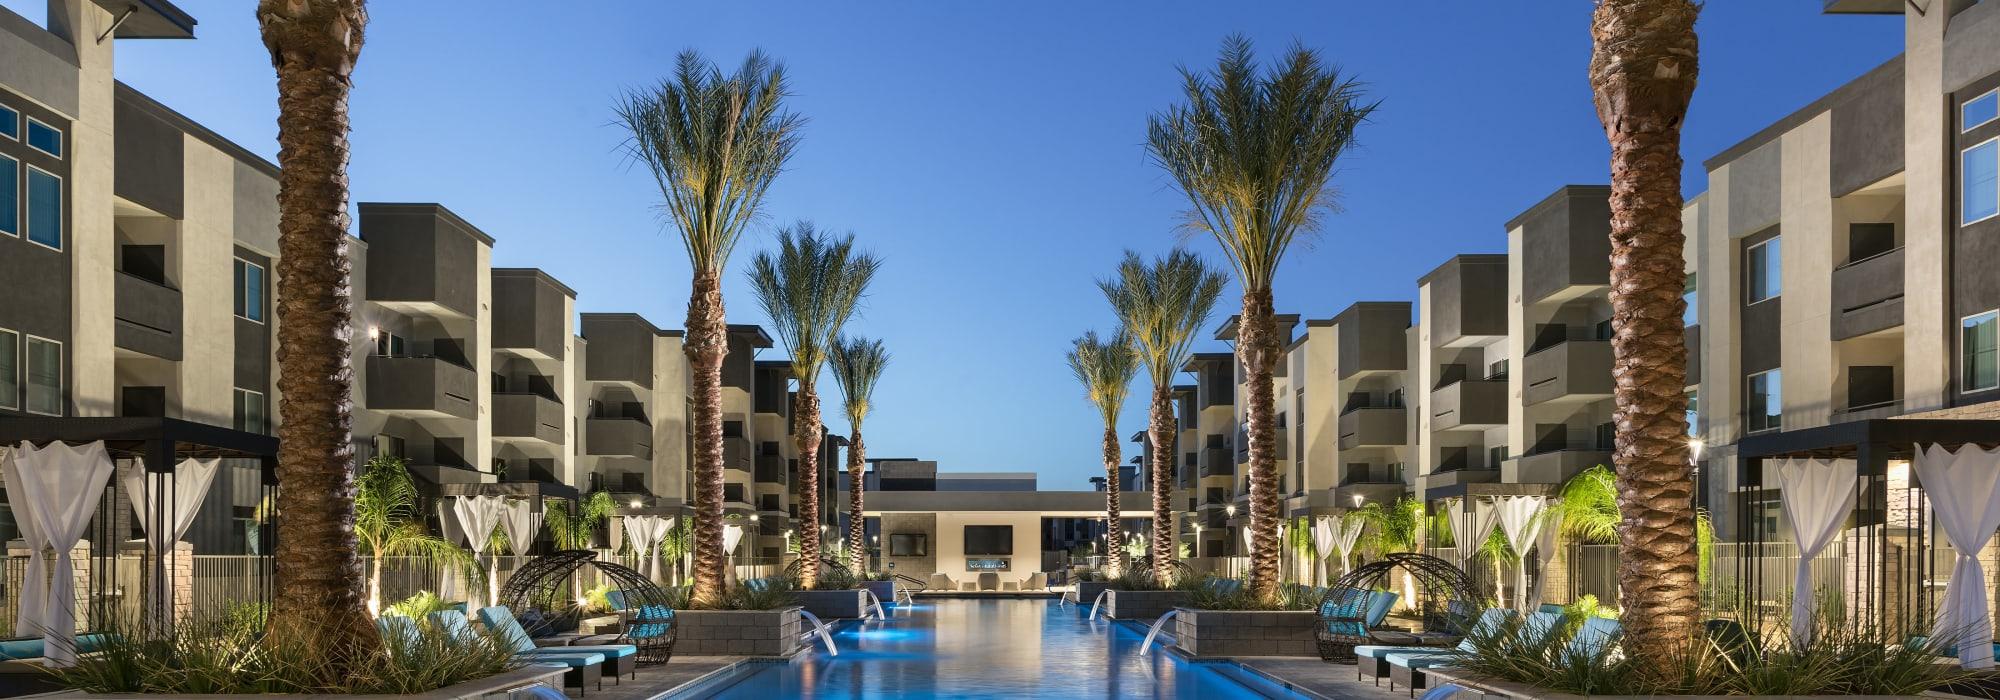 pool at nighttime Aviva in Mesa, Arizona